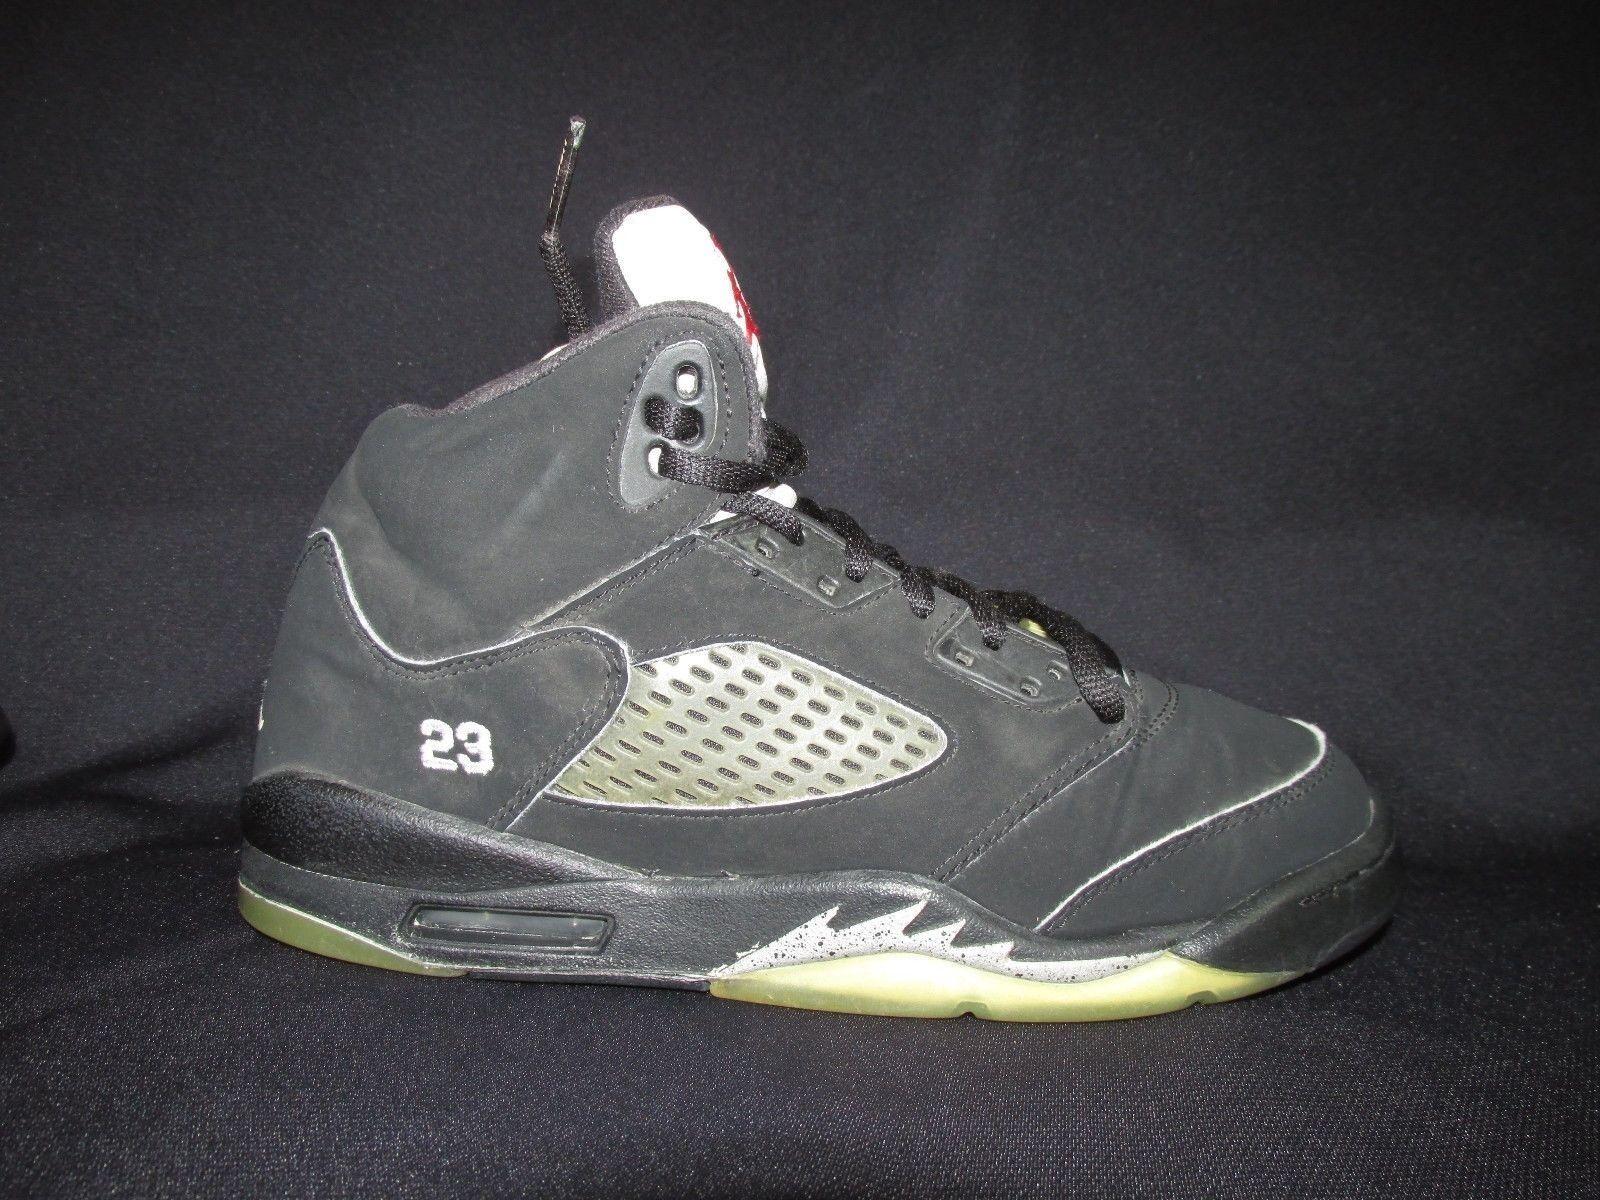 Nike air jordan v 5 134092 2006 retro (gs) 134092 5 004 schwarz metallic silber jugend 5,5 c5e445